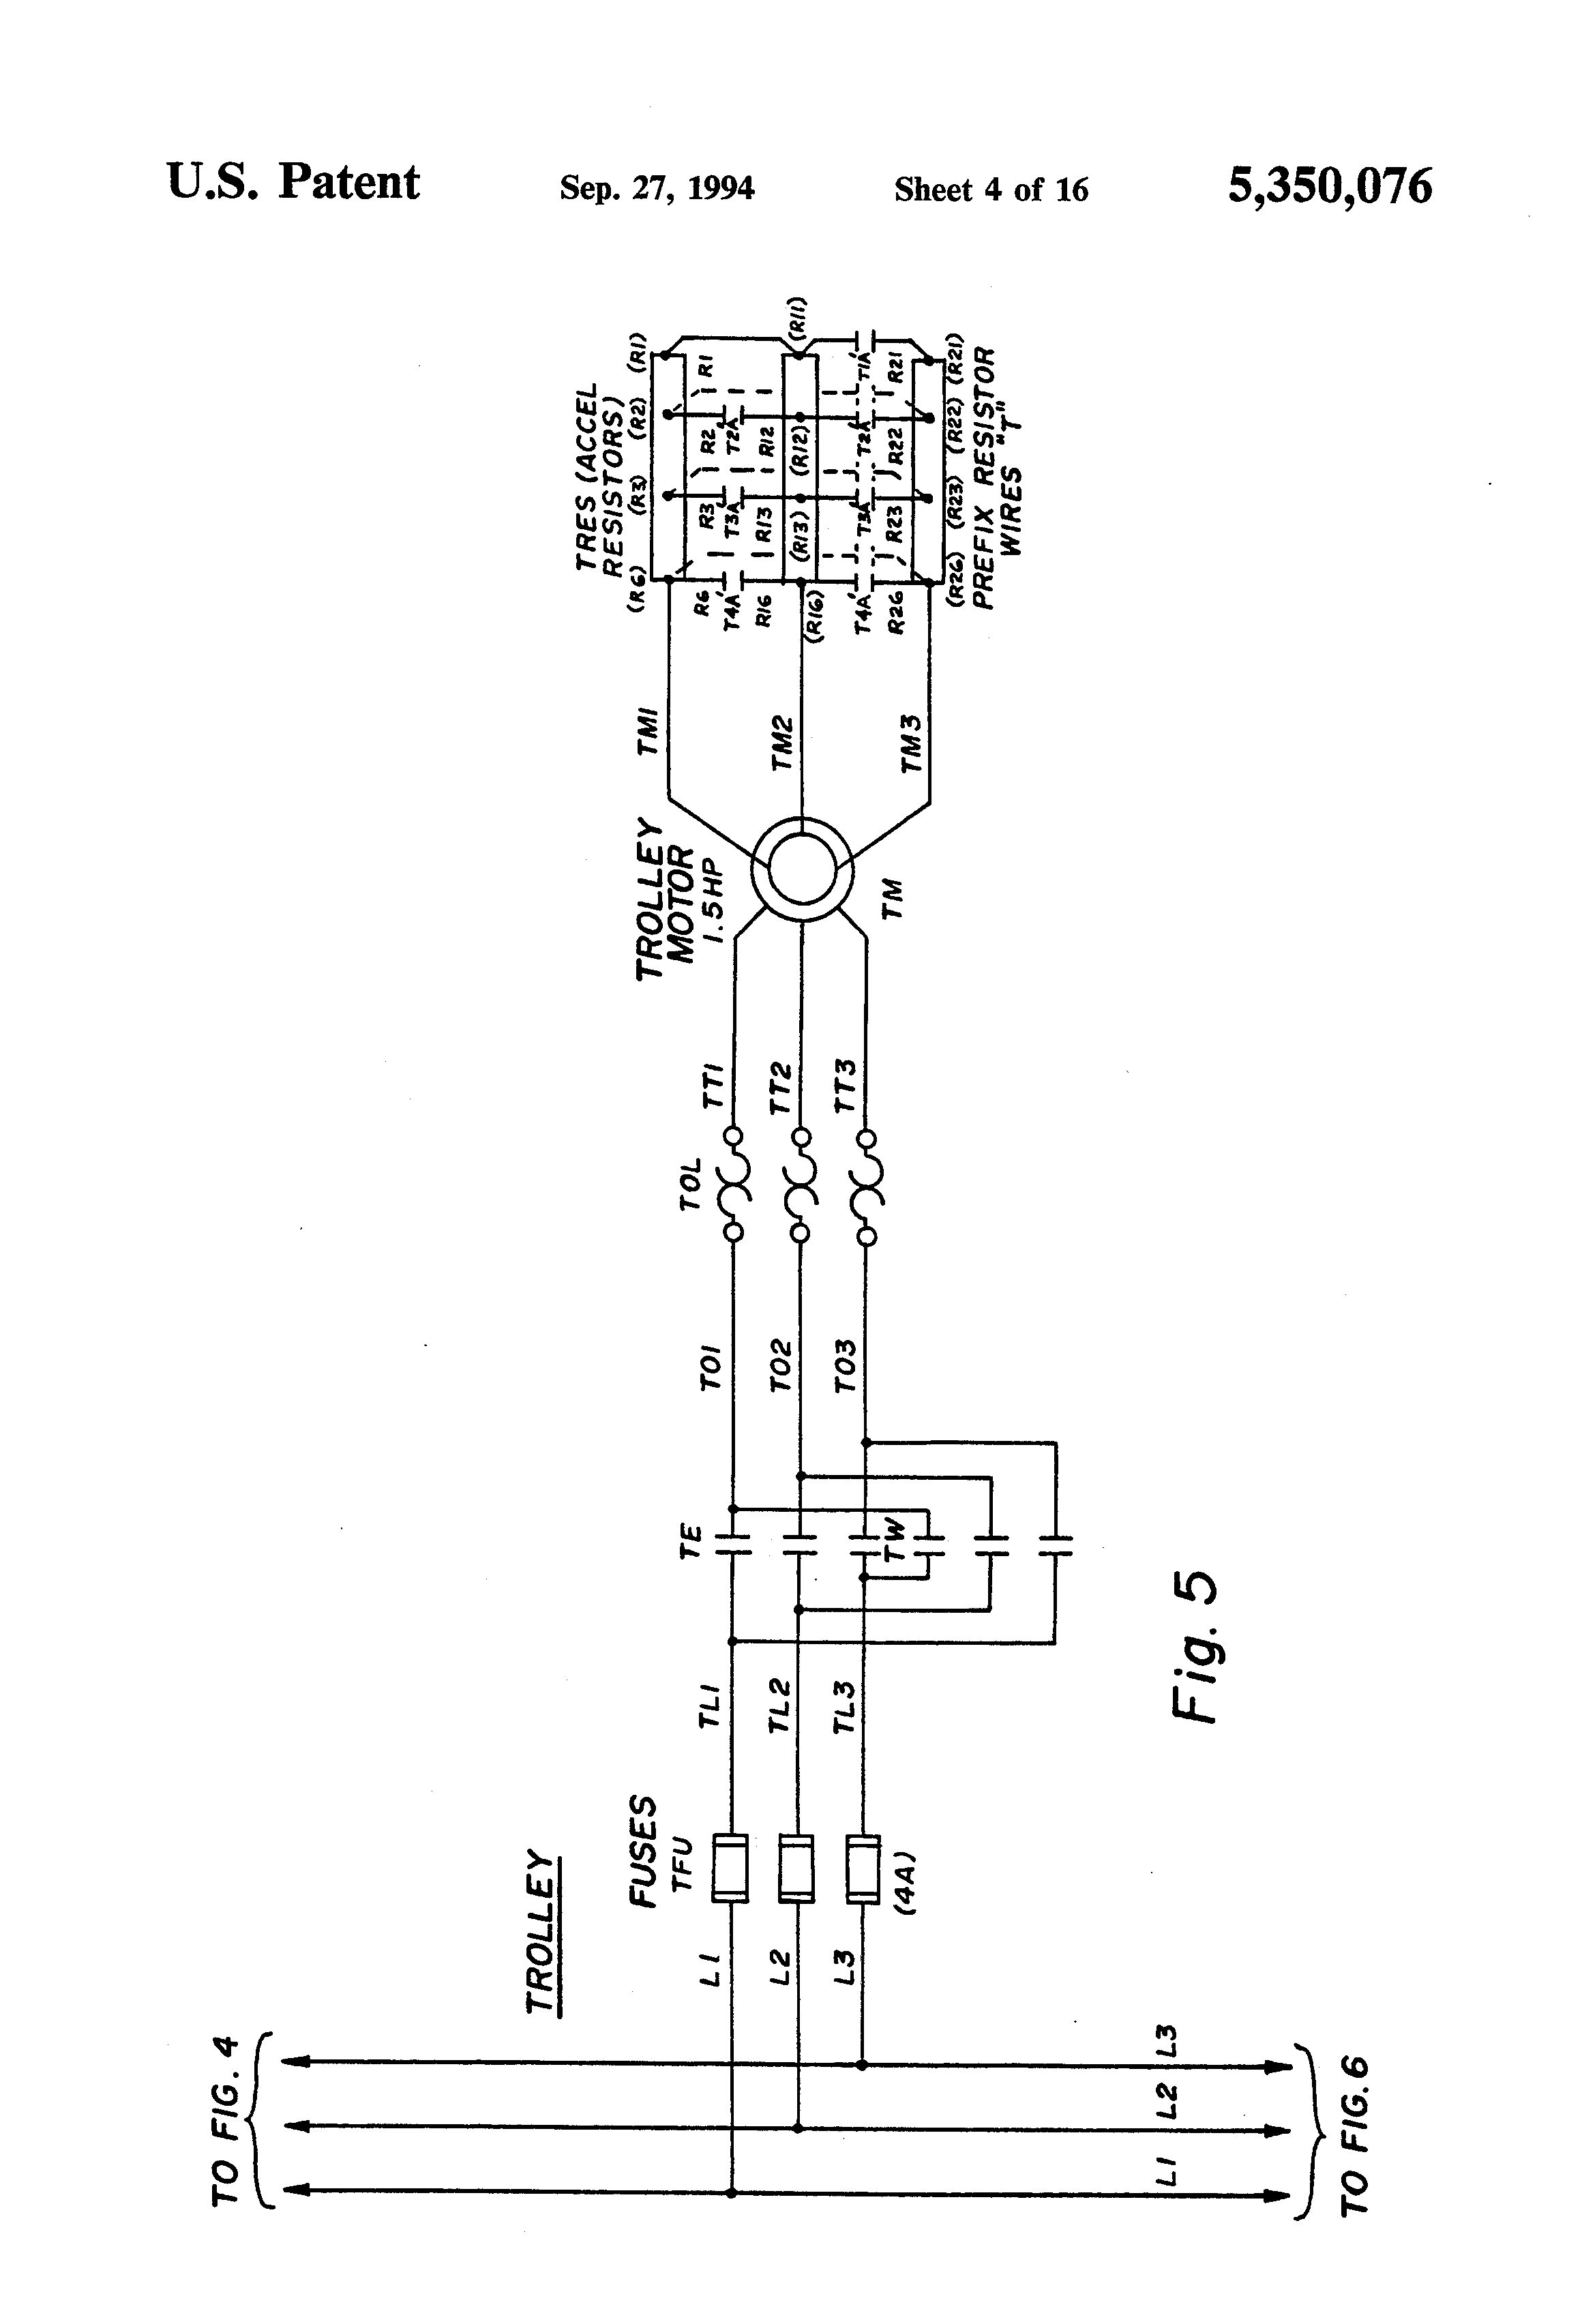 [SCHEMATICS_49CH]  FA_5703] 2 Speed Hoist Pendant Wiring Diagram Wiring Diagram | Demag Hoist Wiring Diagram |  | Anth Rosz Loskopri Stic Licuk Favo Mohammedshrine Librar Wiring 101